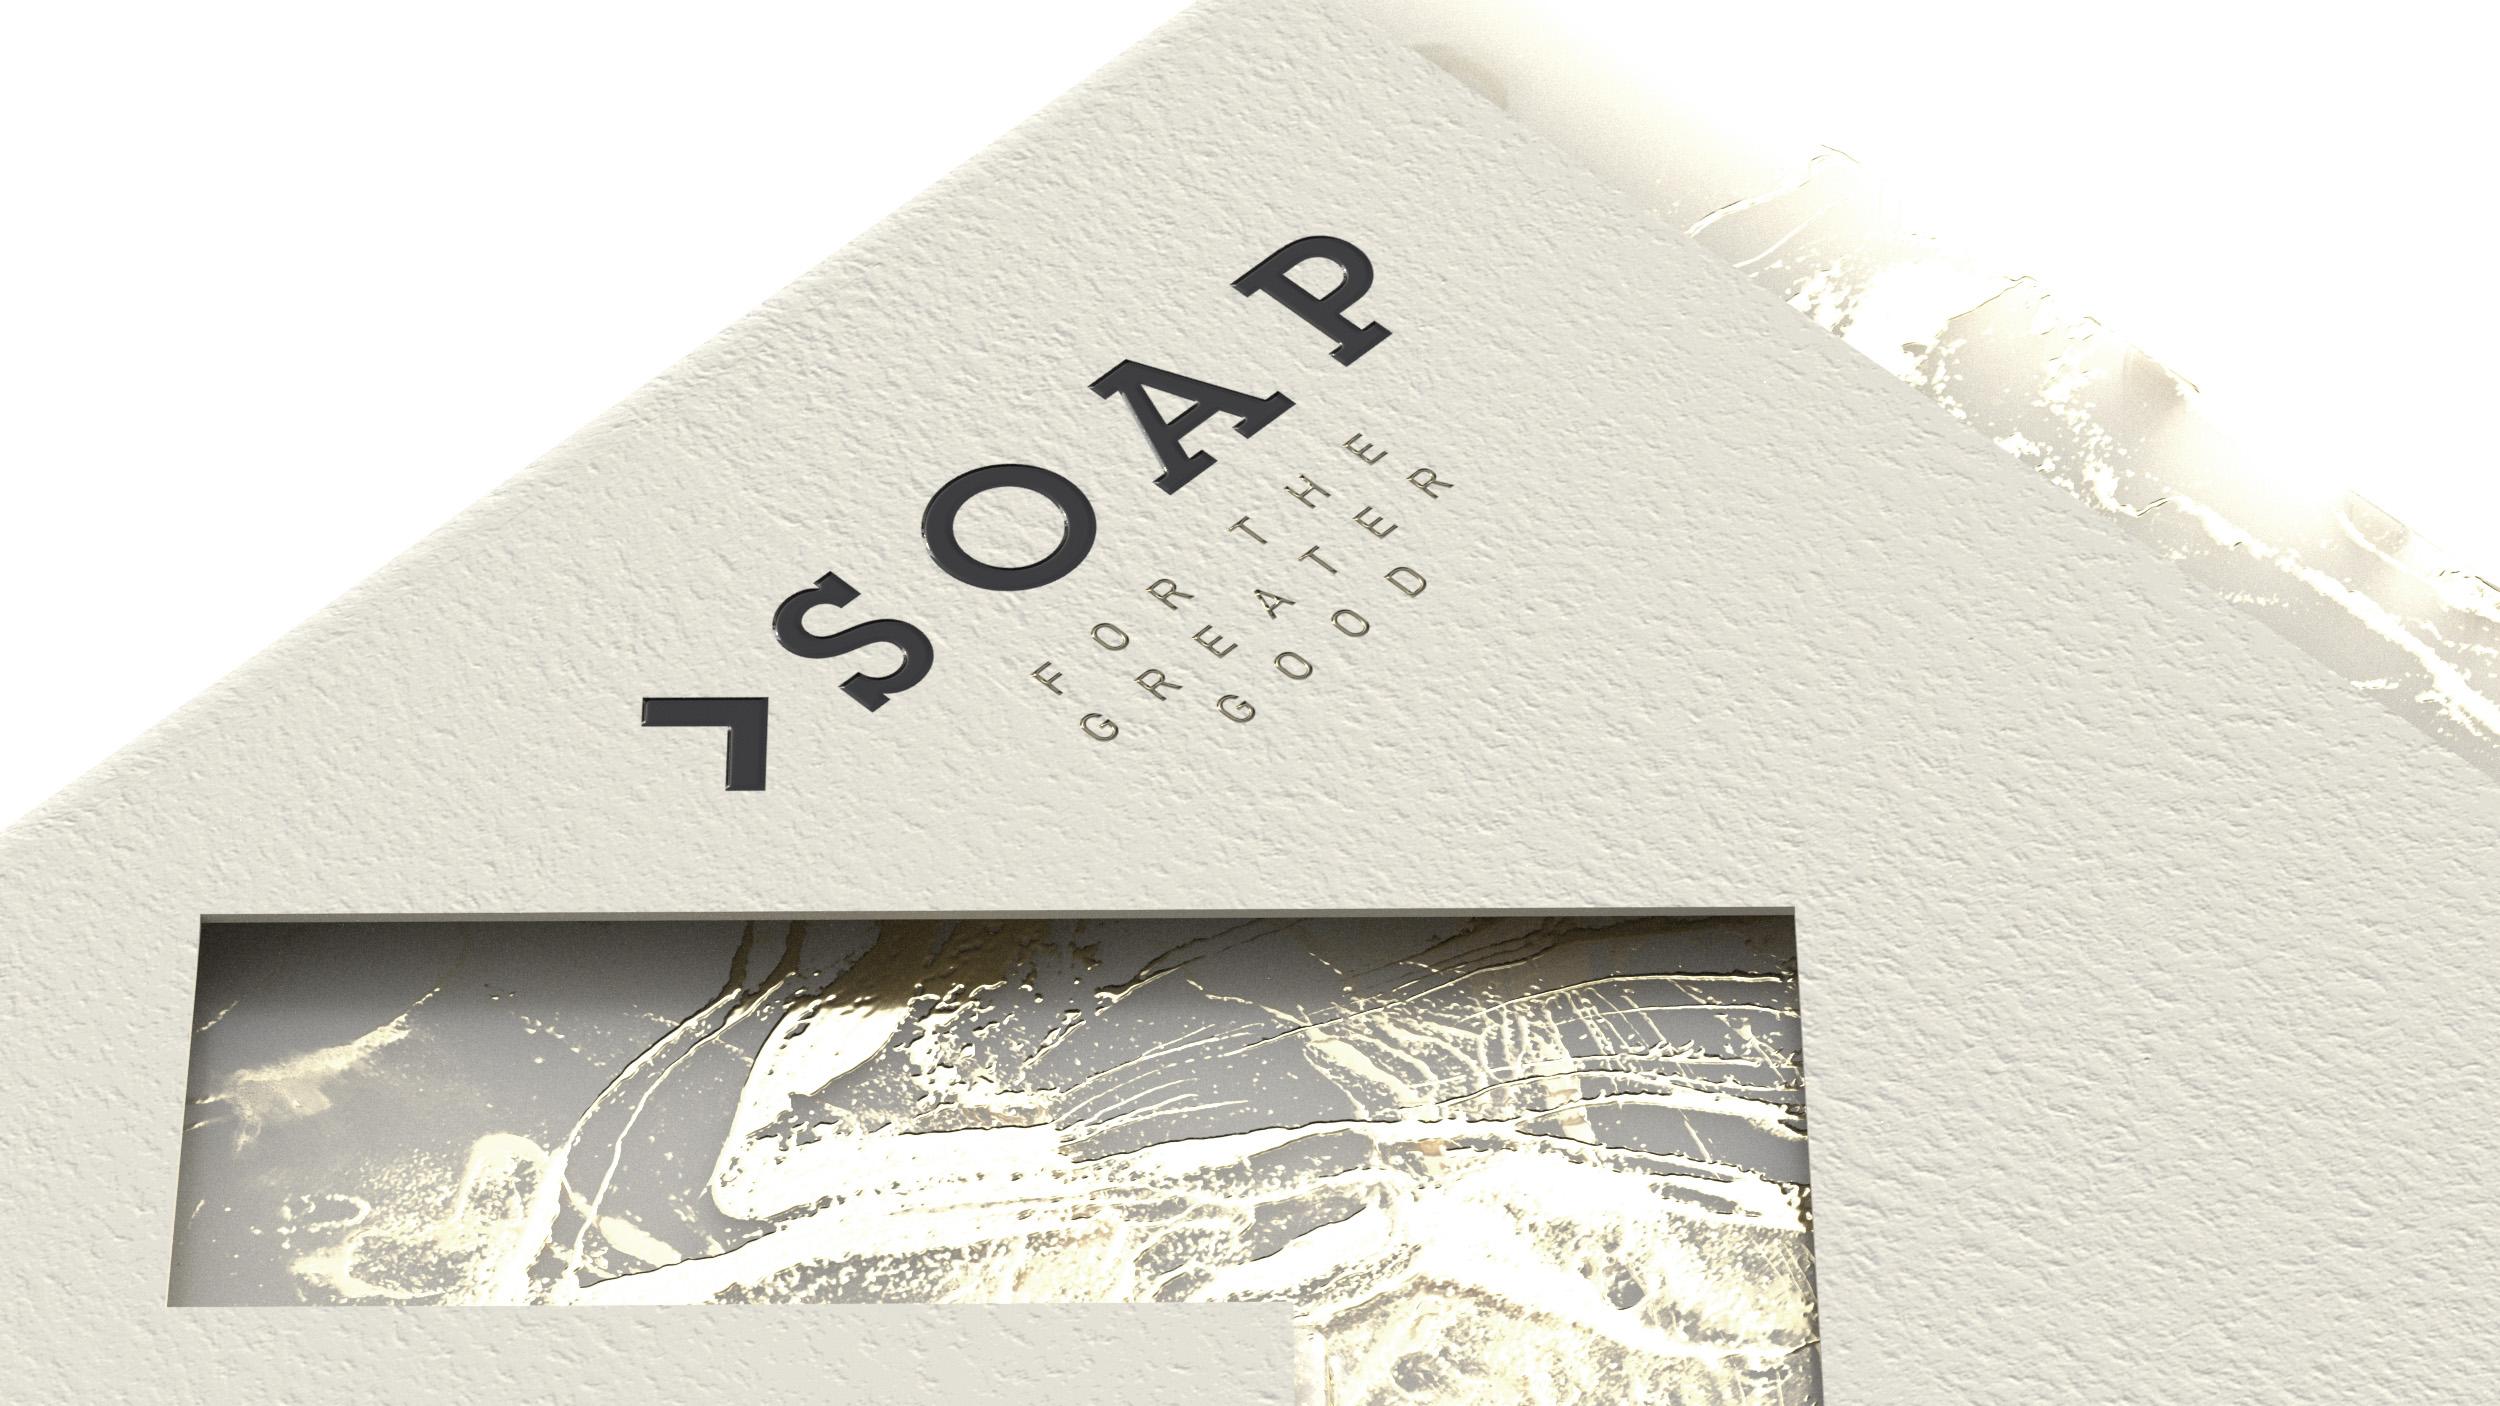 JDO Creates Soap to Raise Awareness of Hygiene Poverty